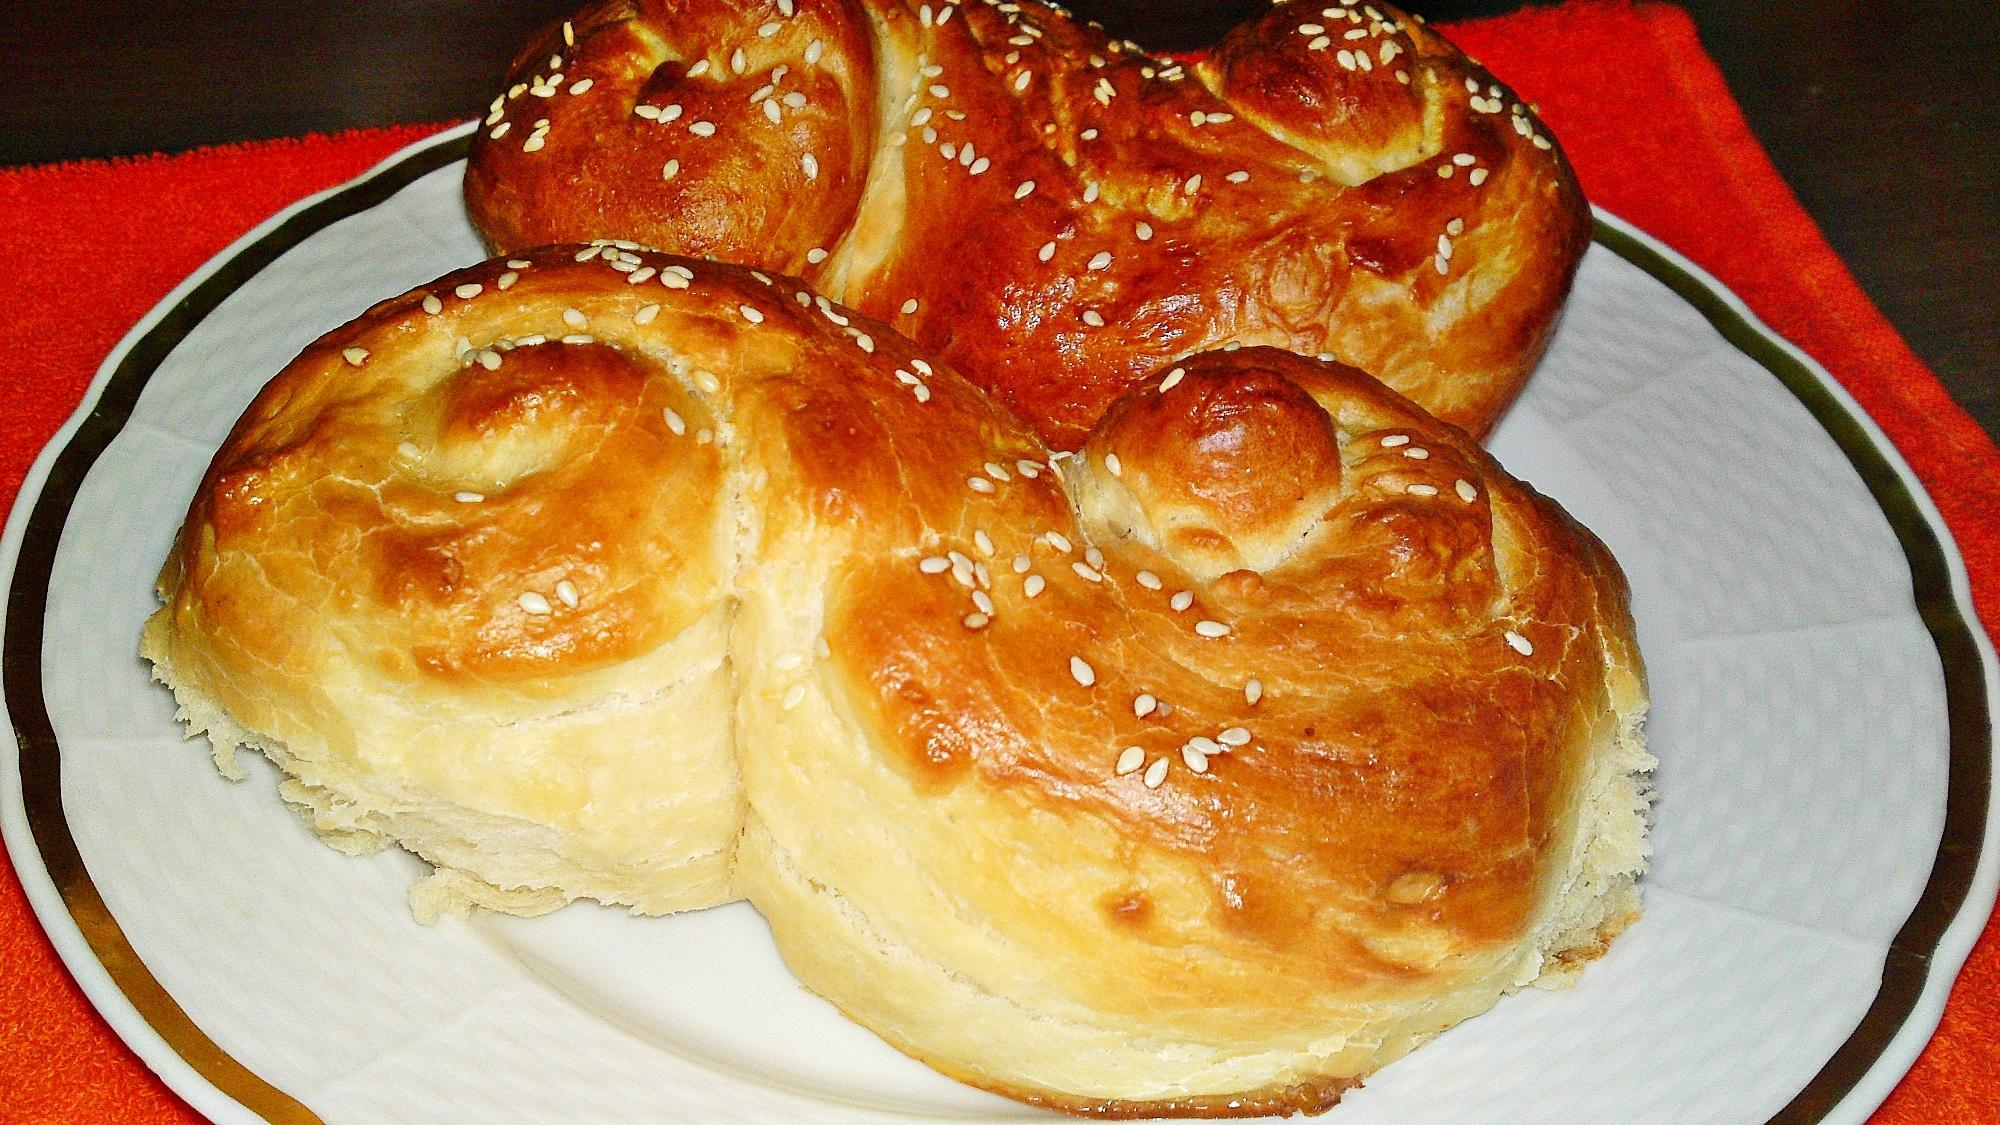 Pane siciliano - Sicilský chléb